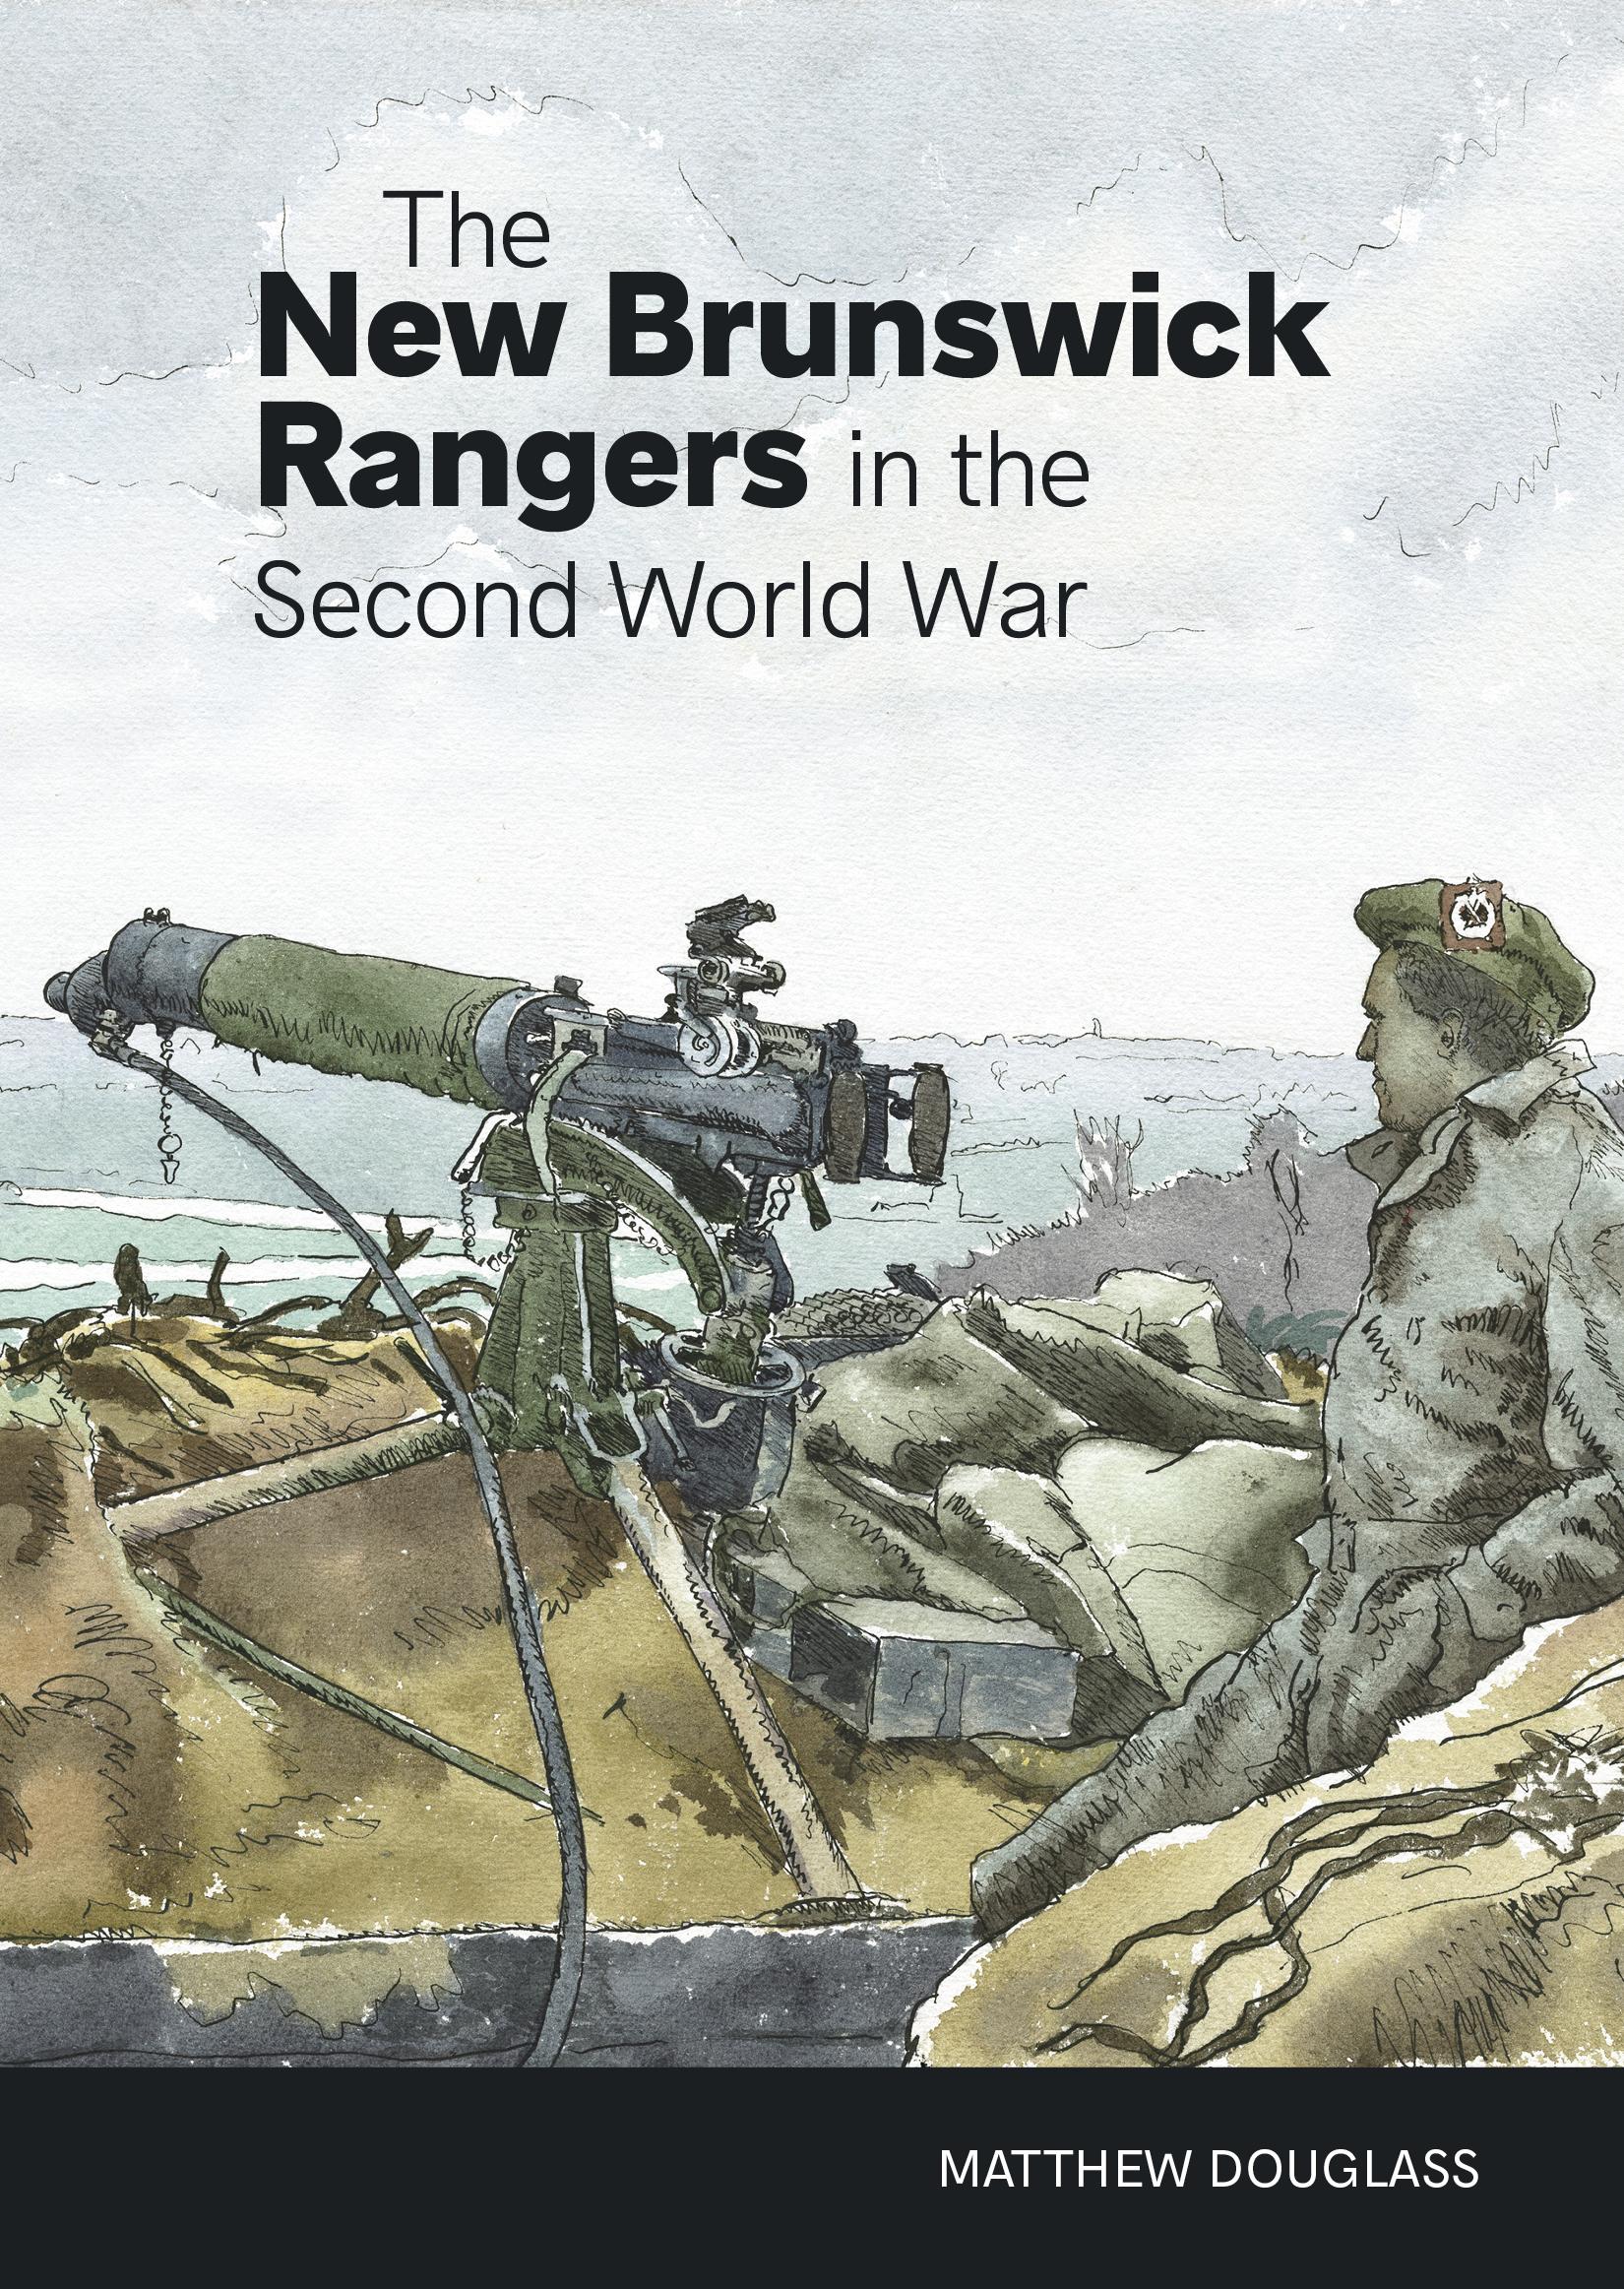 New Brunswick Rangers in the Second World War